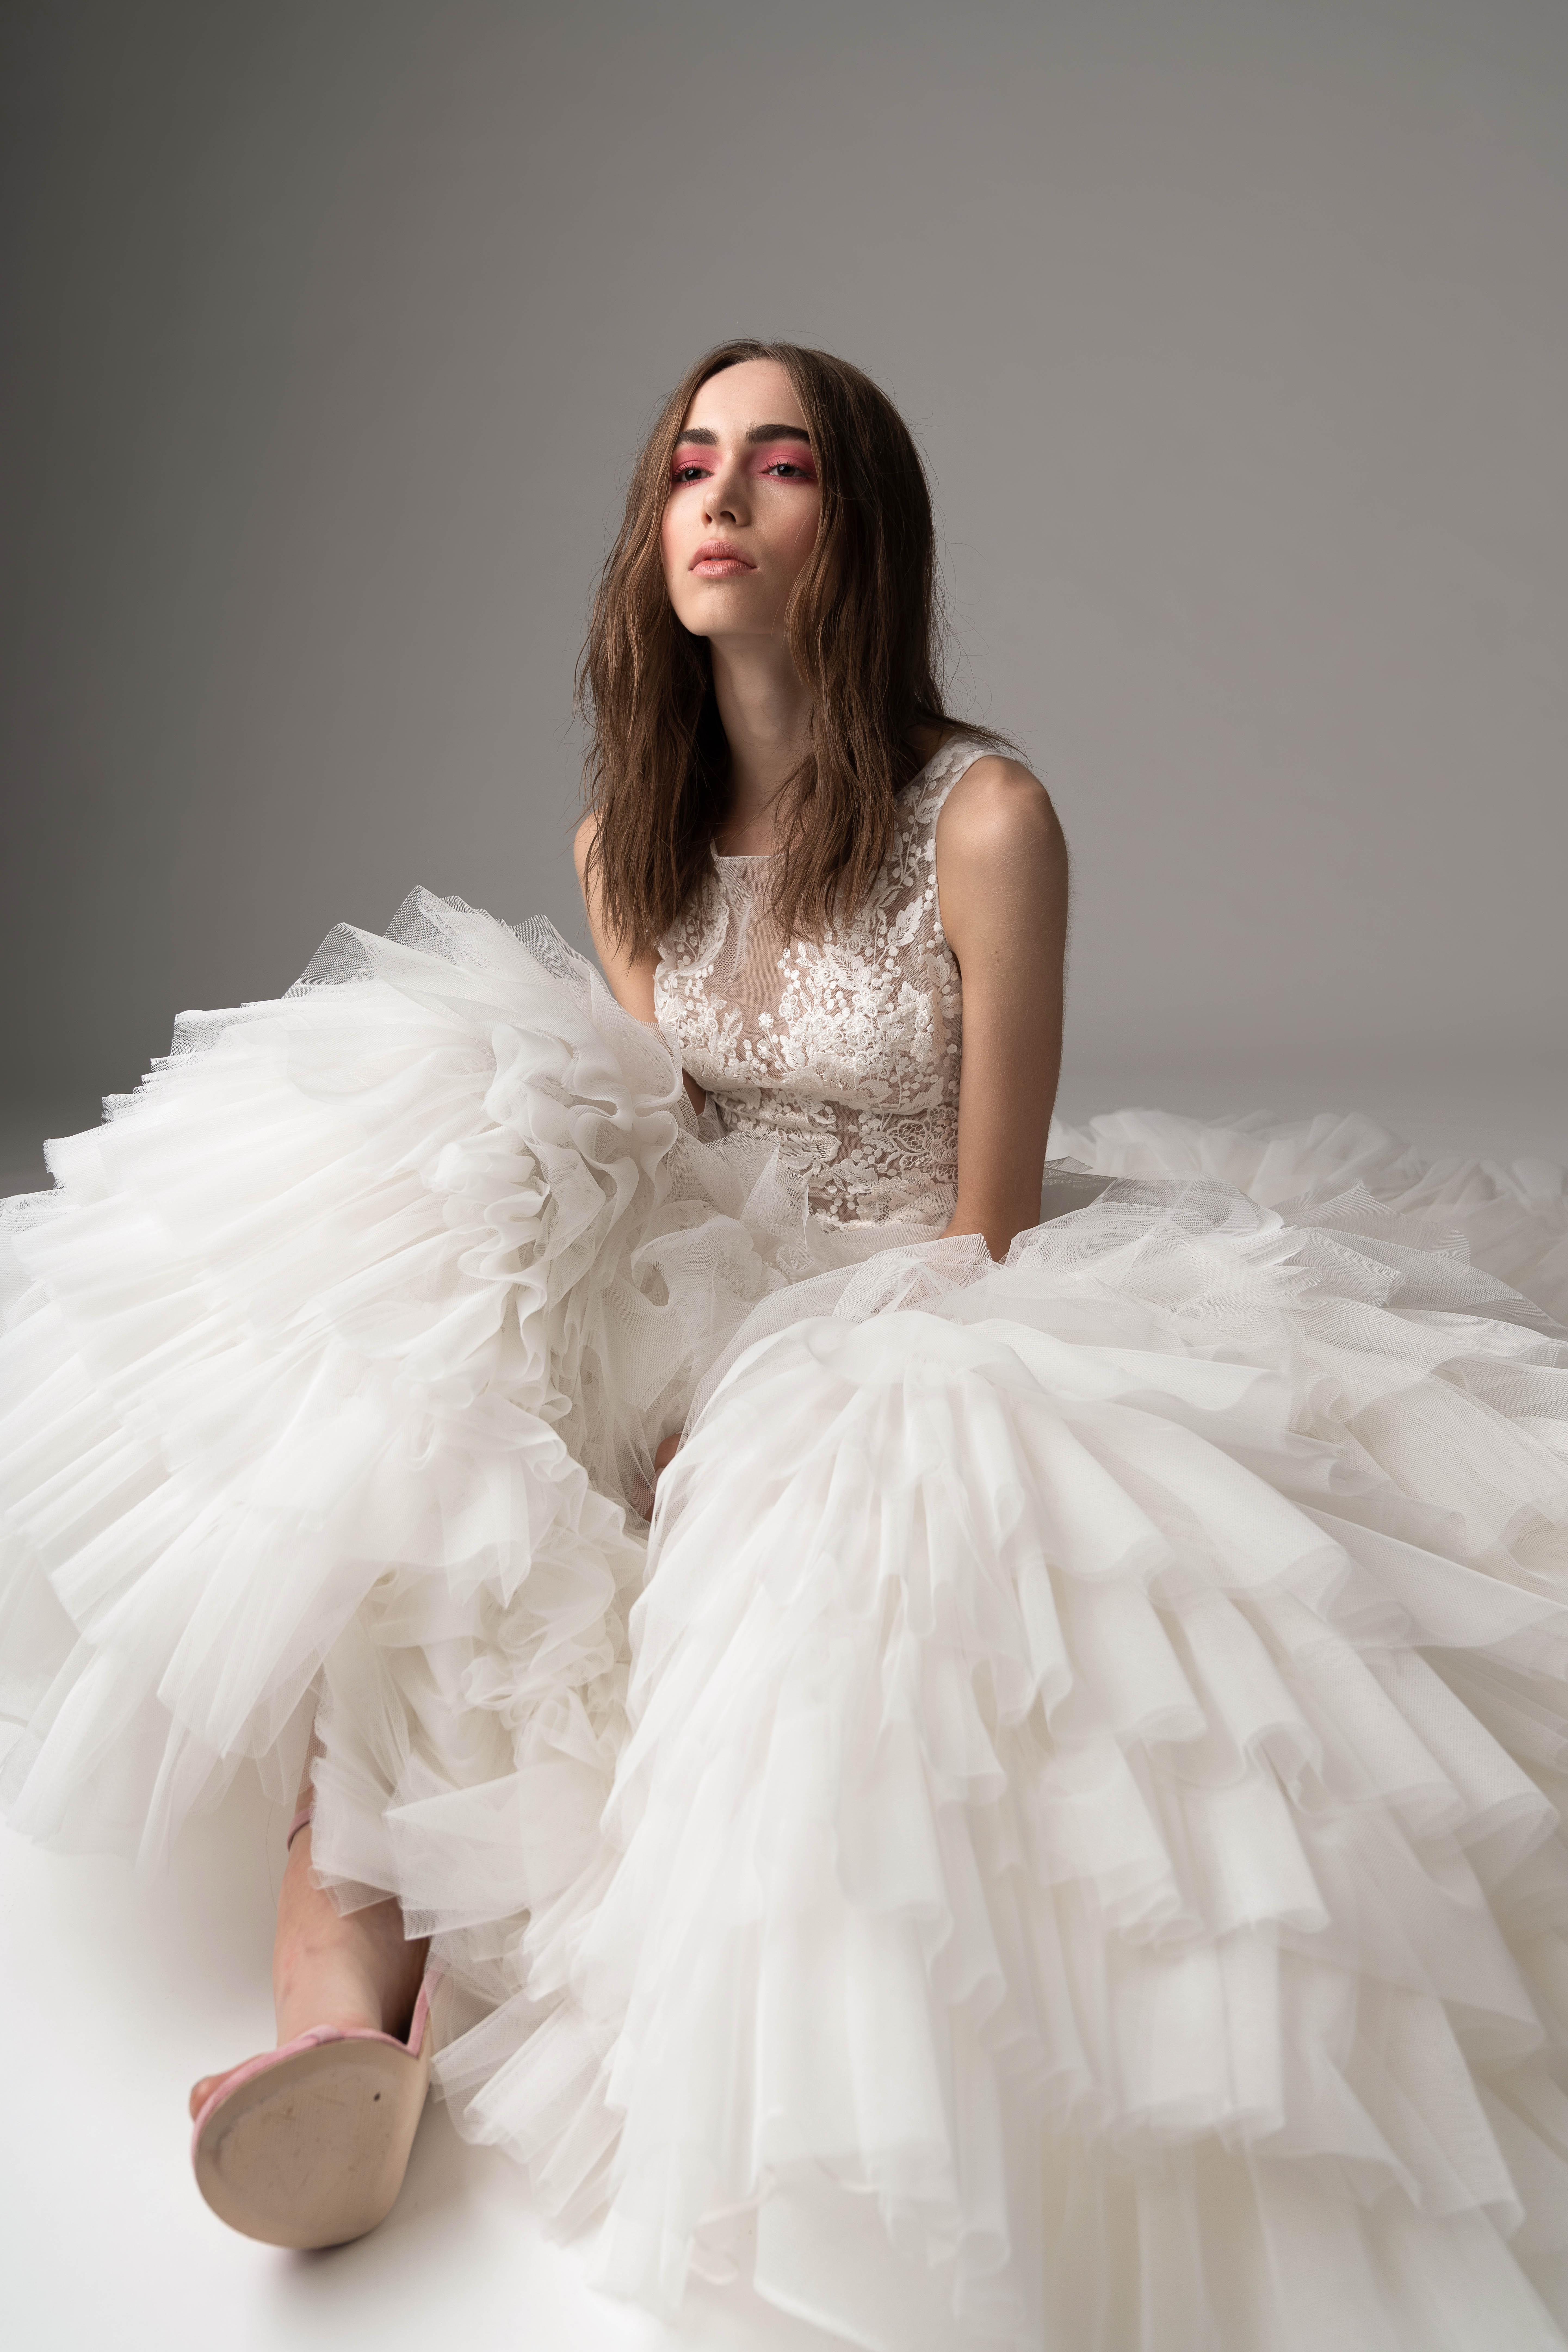 rivini by rita fall 2019 high neck tulle wedding dress